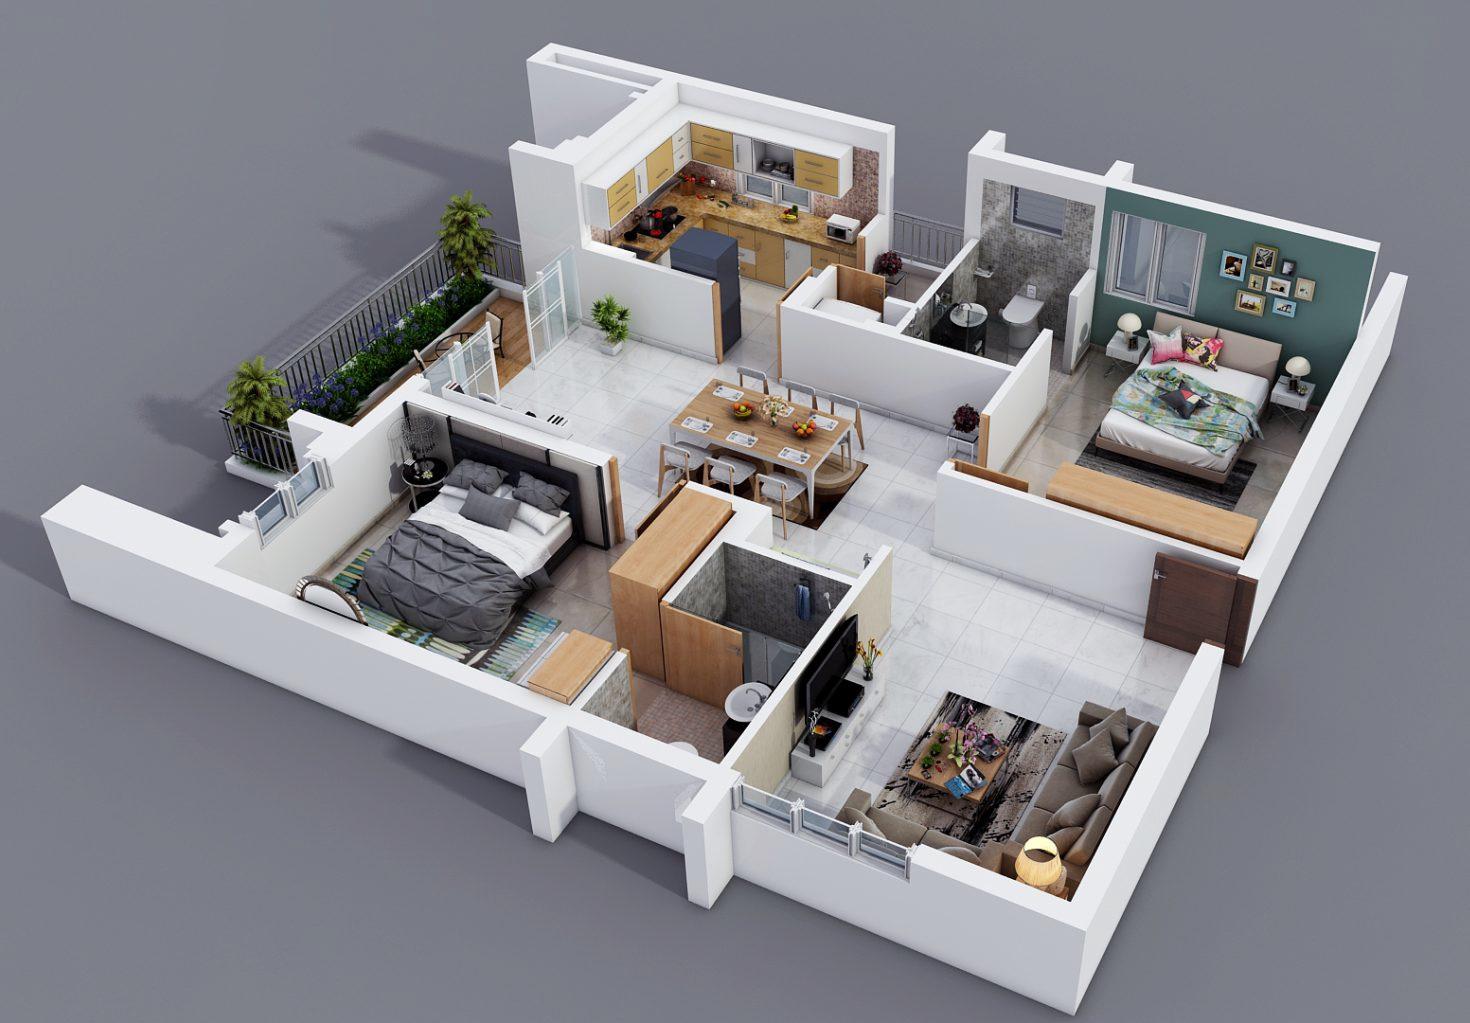 anjani pearl towers apartment 2bhk 1523sqft11